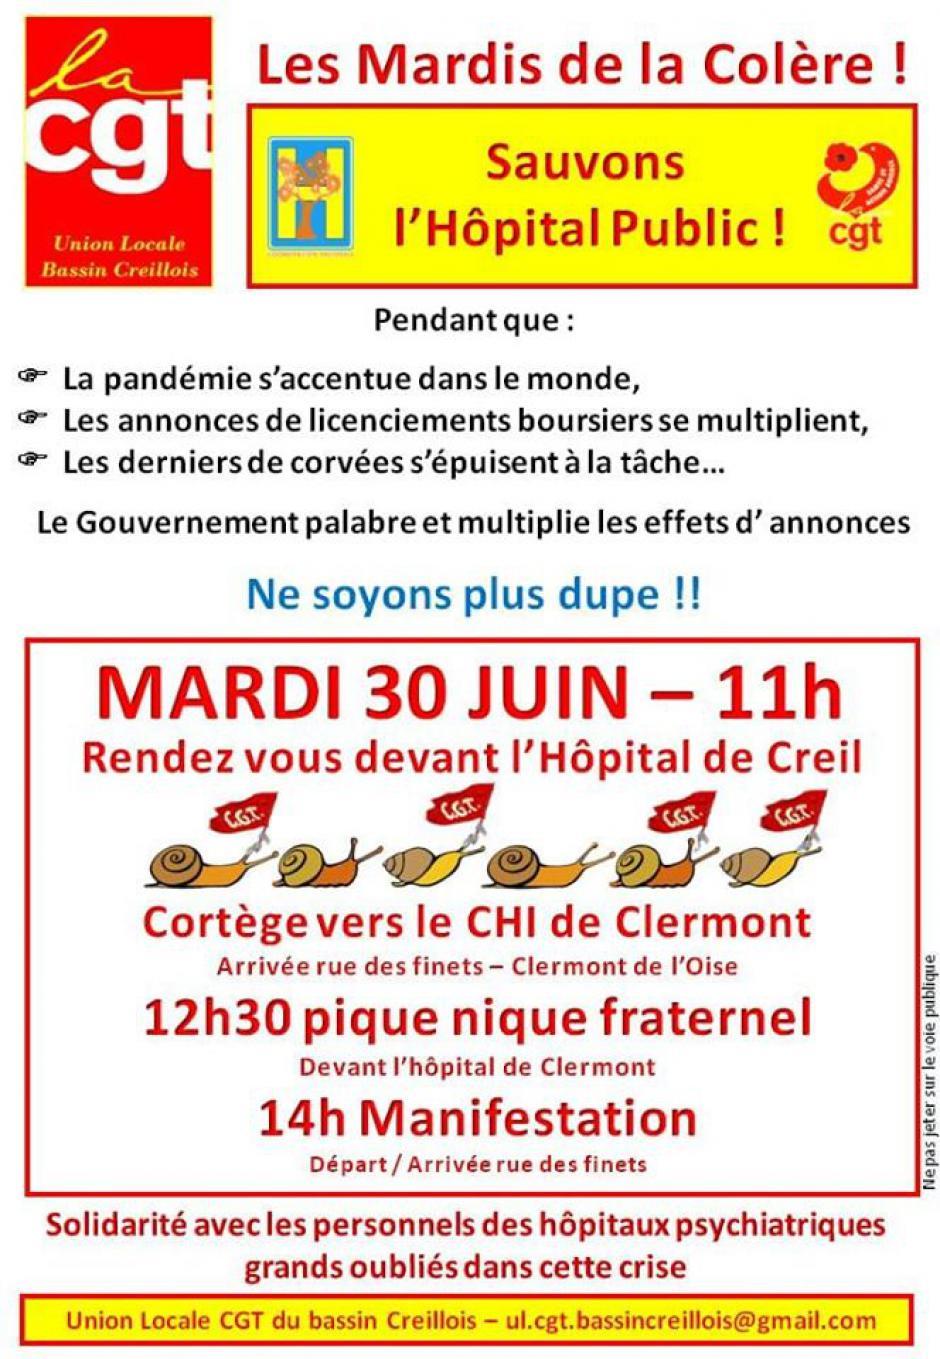 Tract « Les Mardis de la Colère : sauvons l'hôpital public » - UL CGT Bassin Creillois, 30 juin 2020